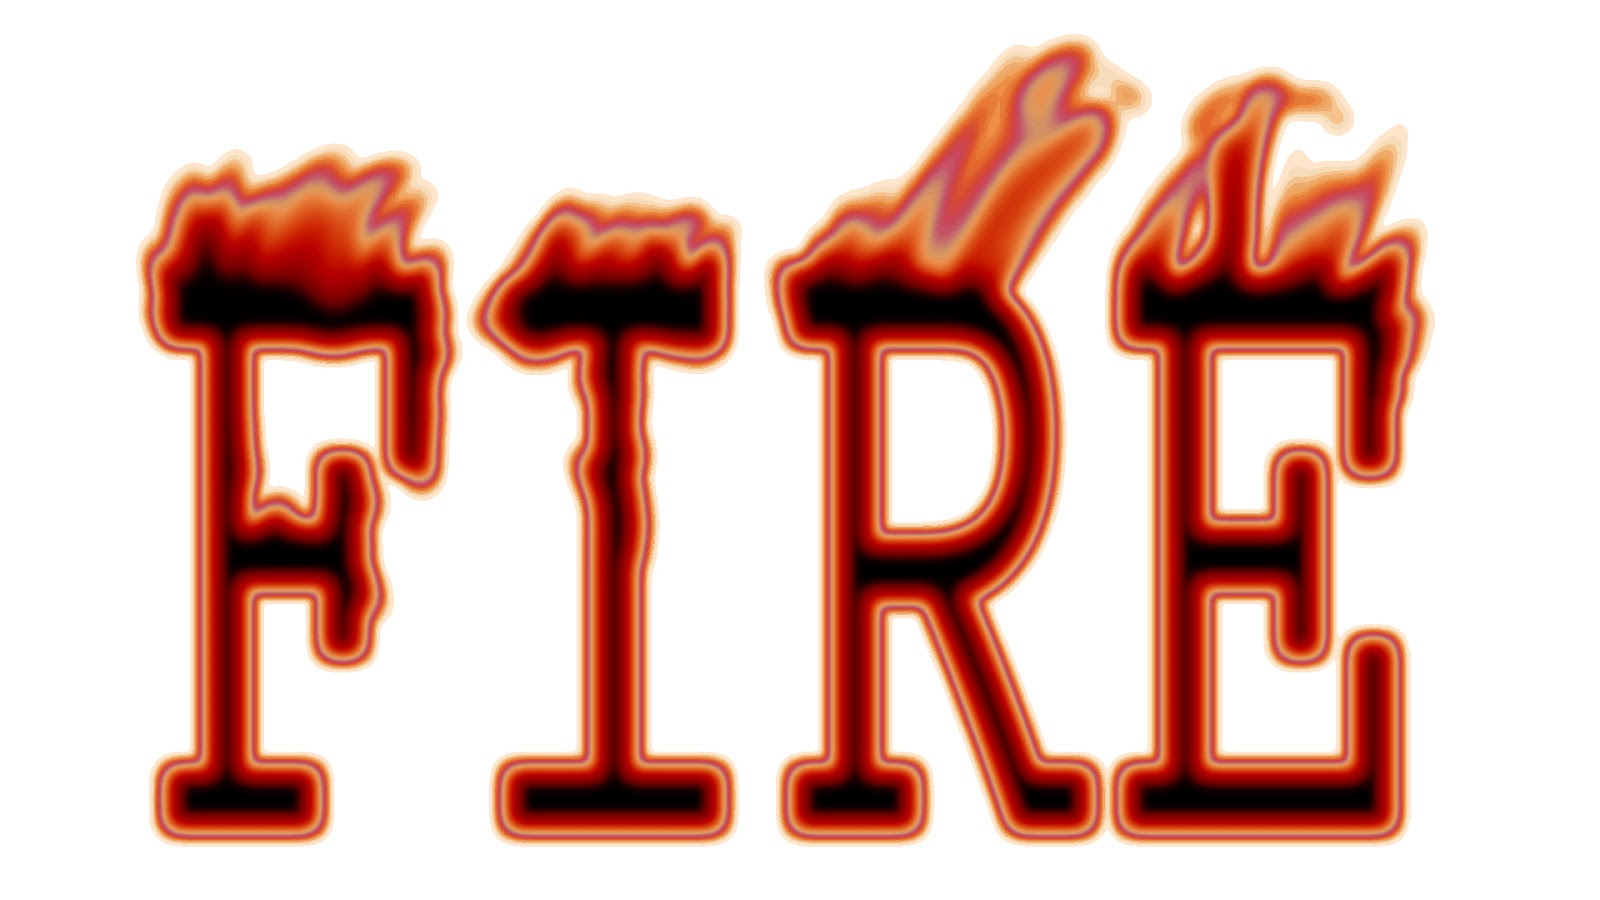 Burning Text on 2012 05 24